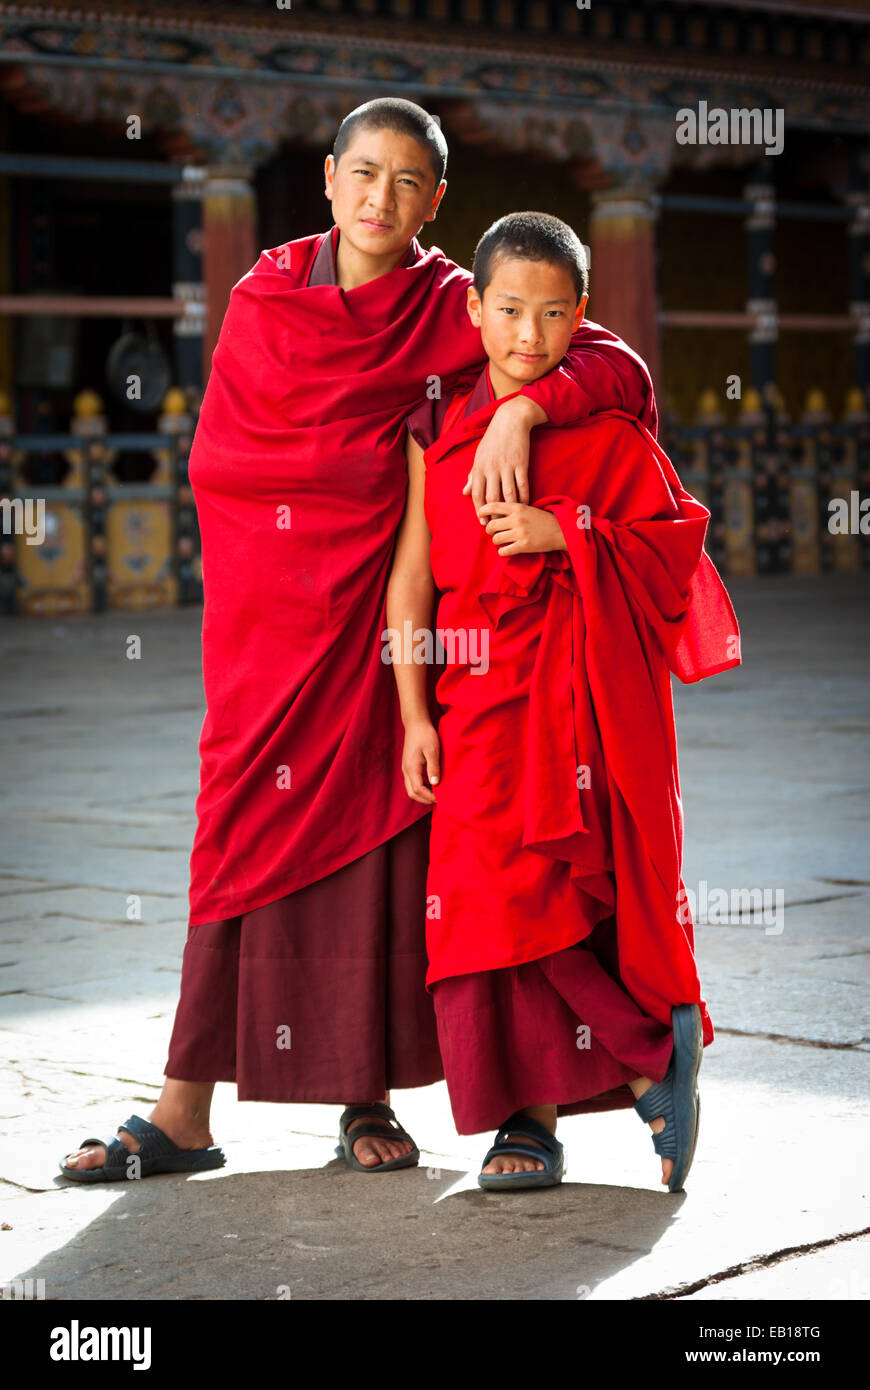 Young Bhutanese Buddhist monks in crimson robes at Paro Dzong, Bhutan - Stock Image